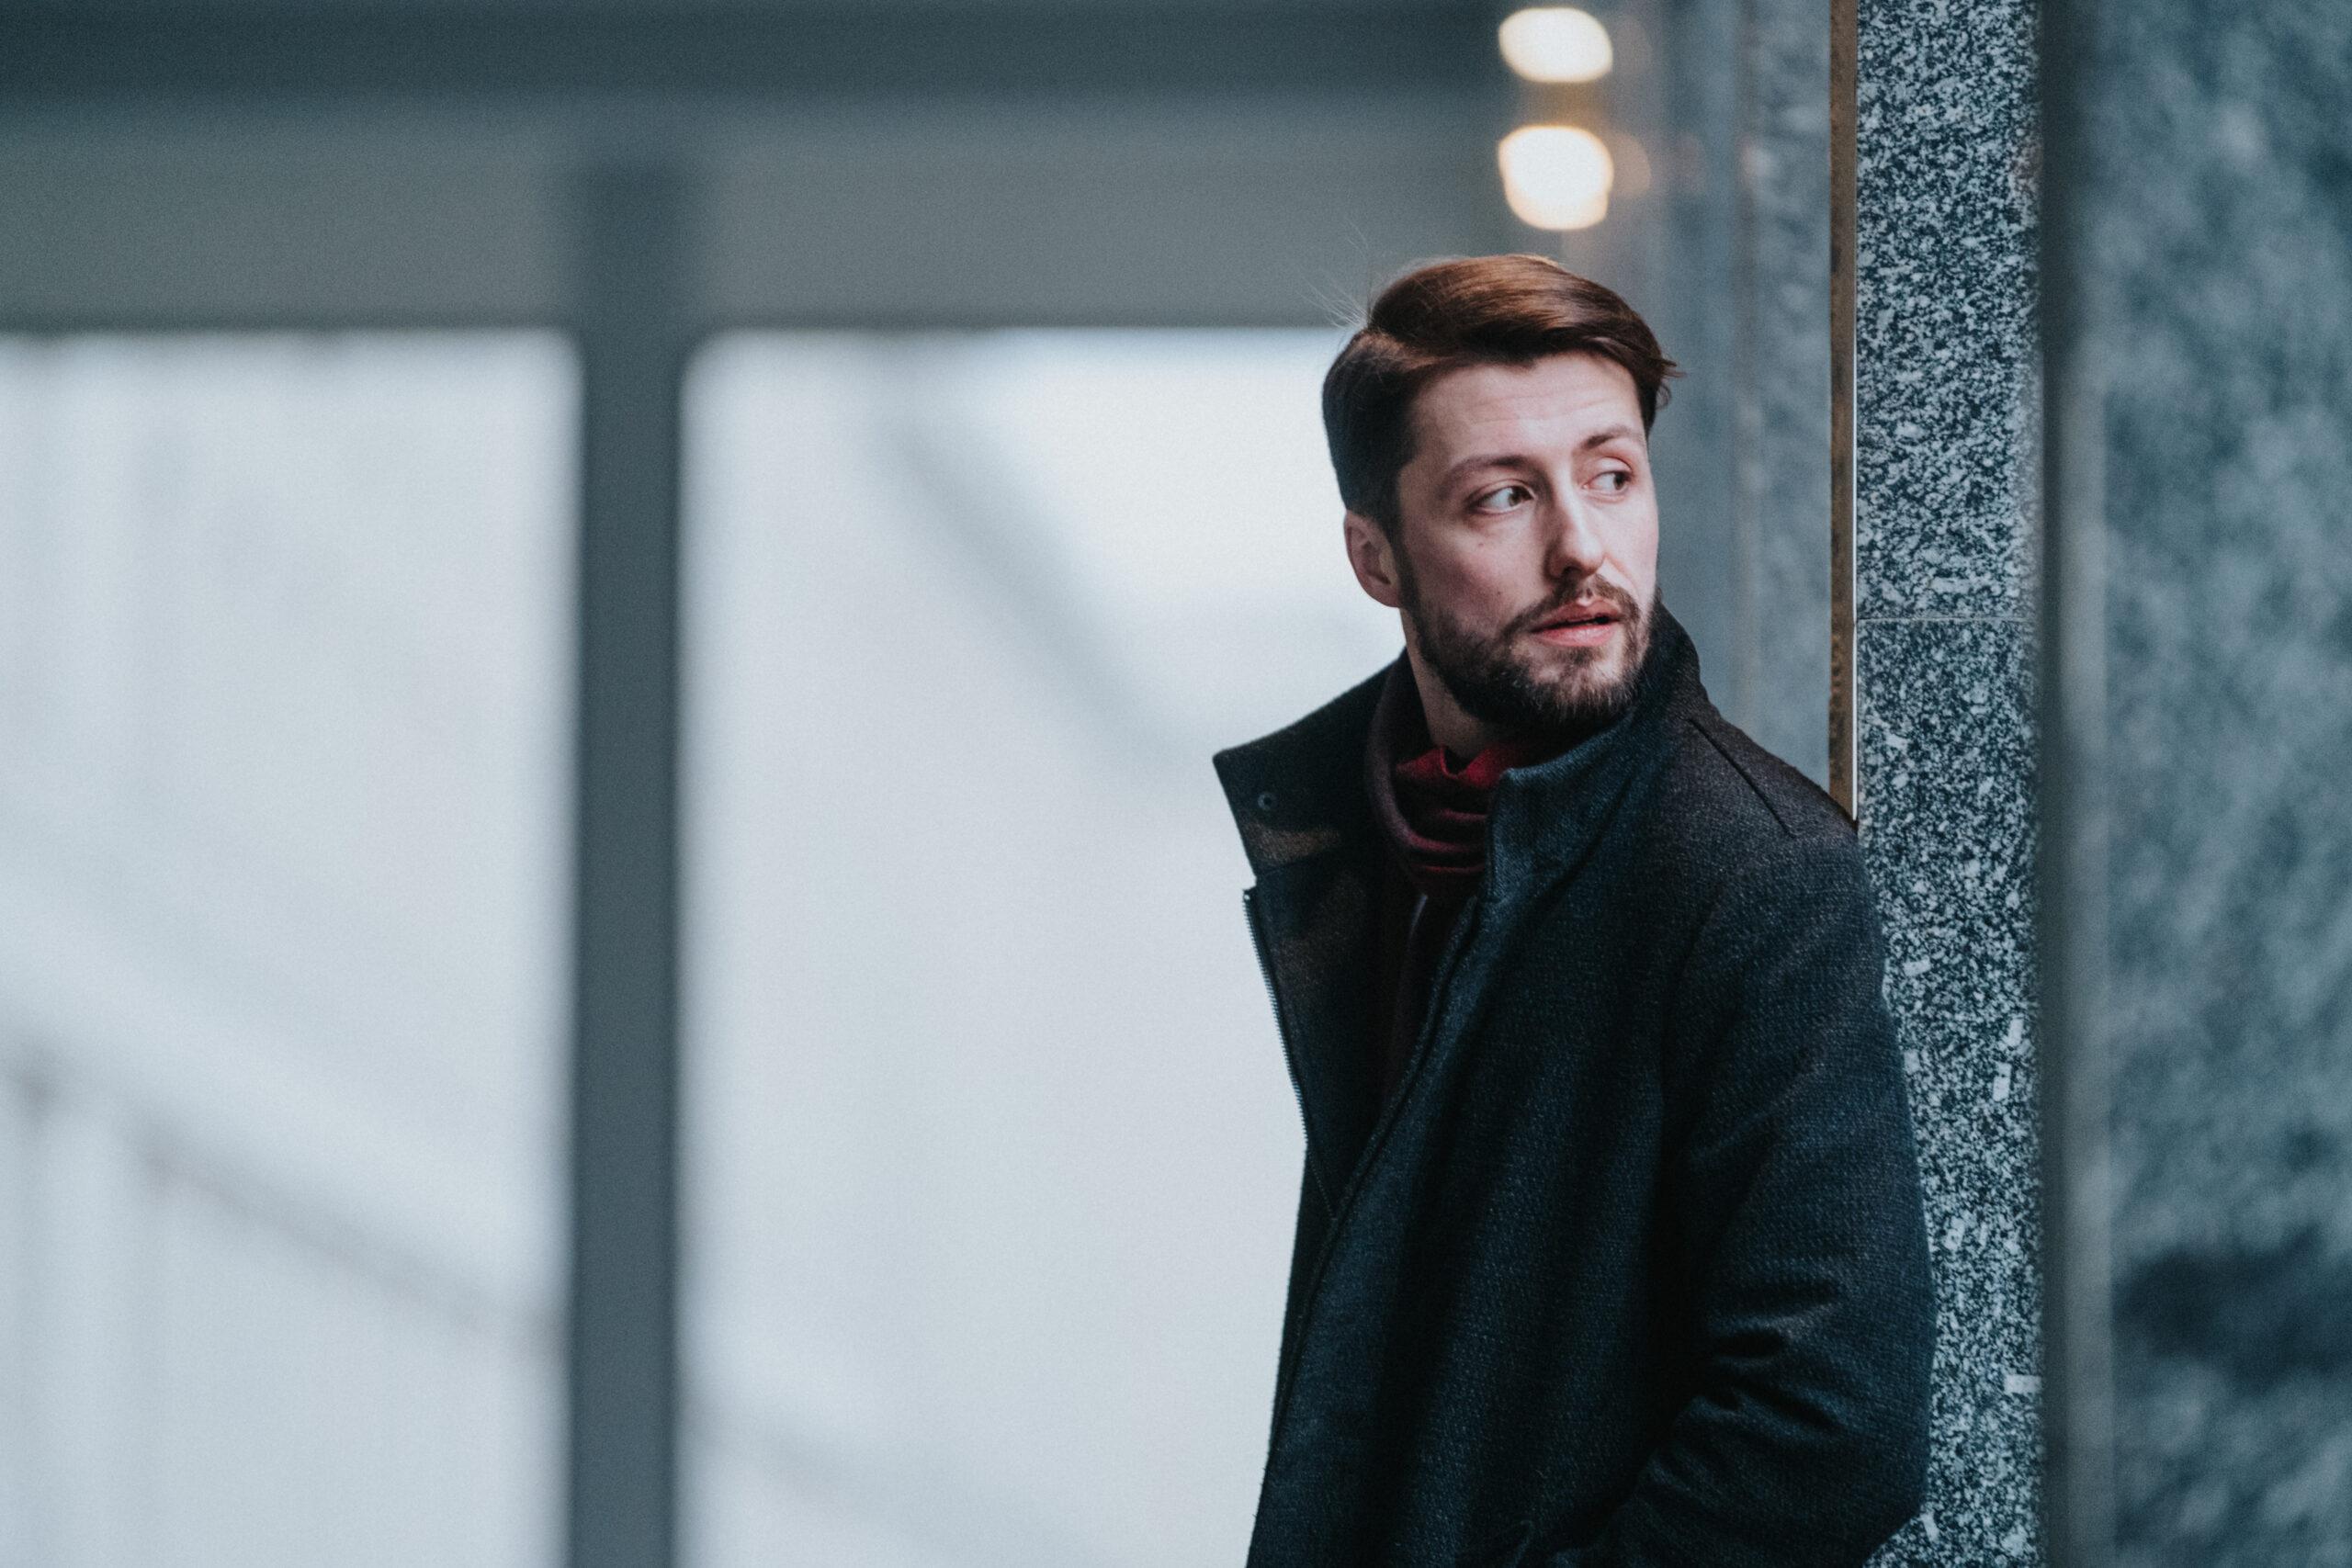 Fot. Paweł Balejko